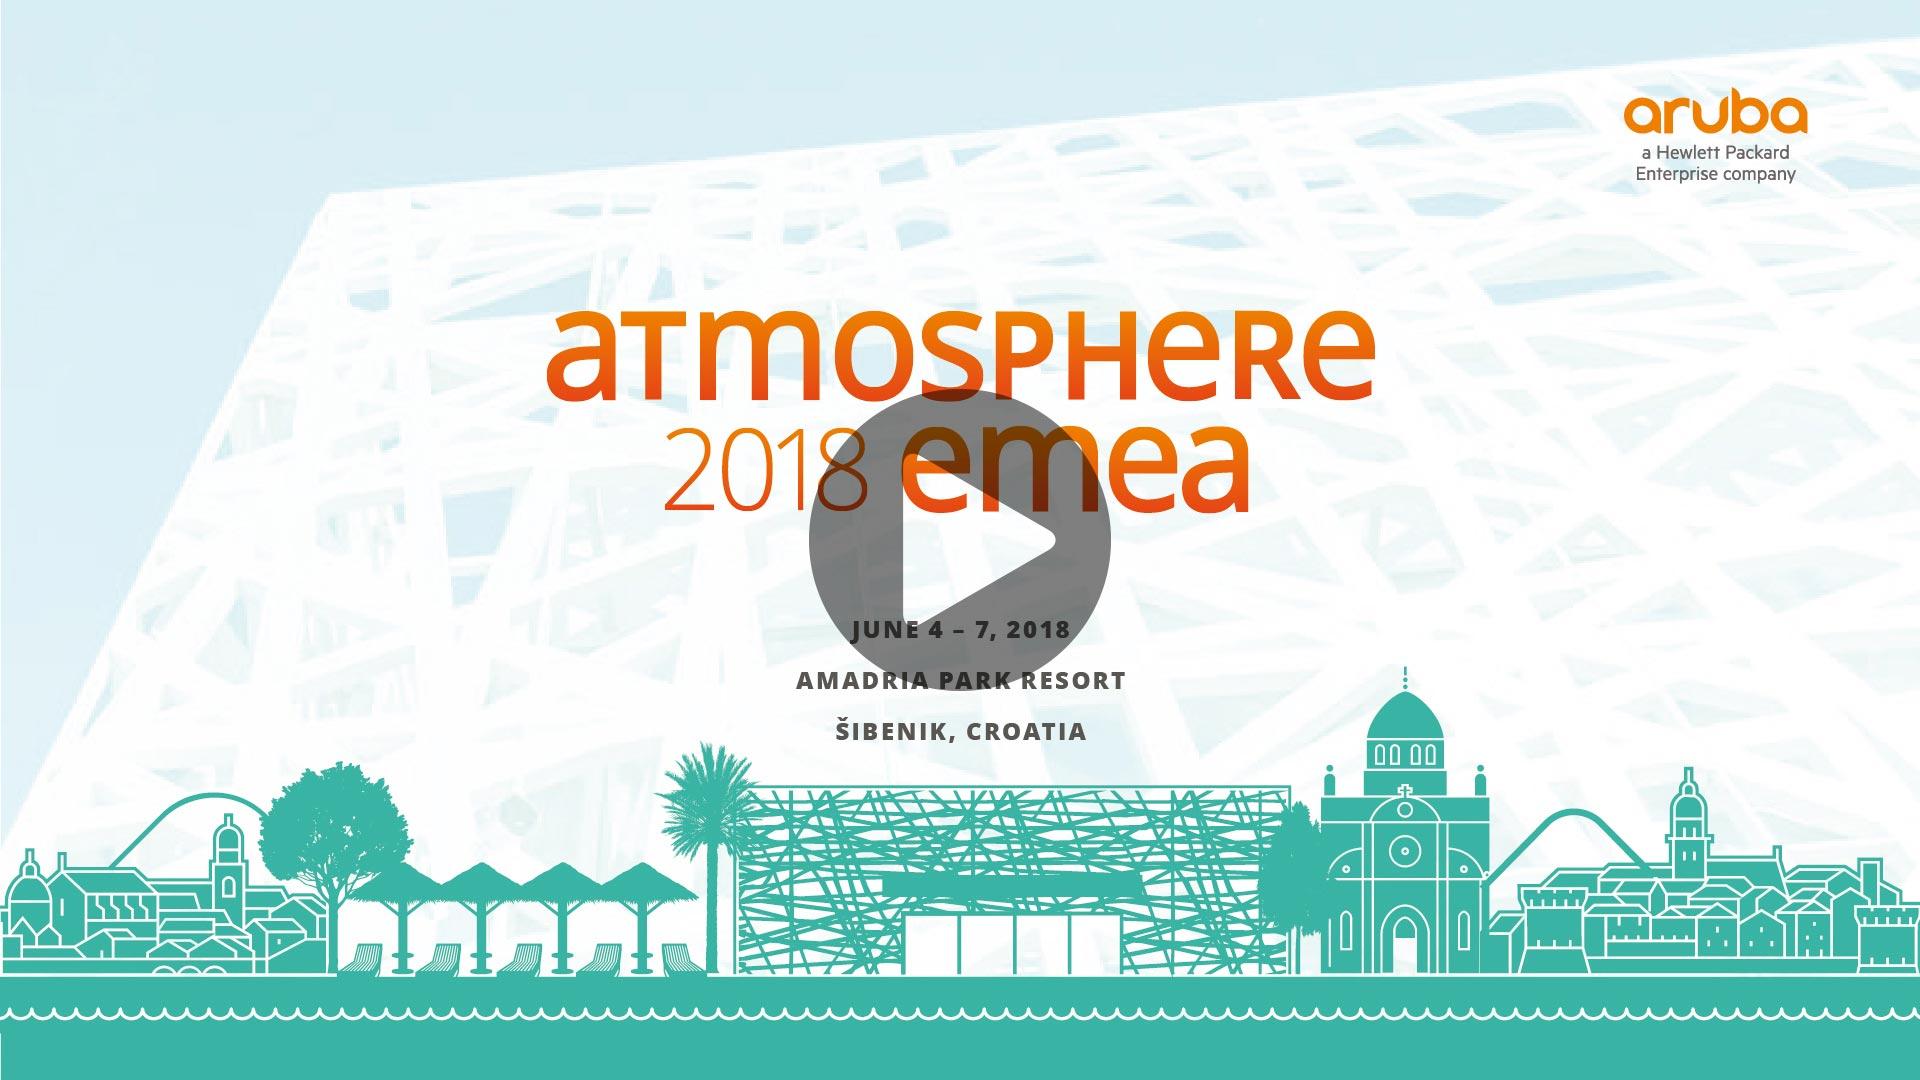 Atmosphere Emea 2018